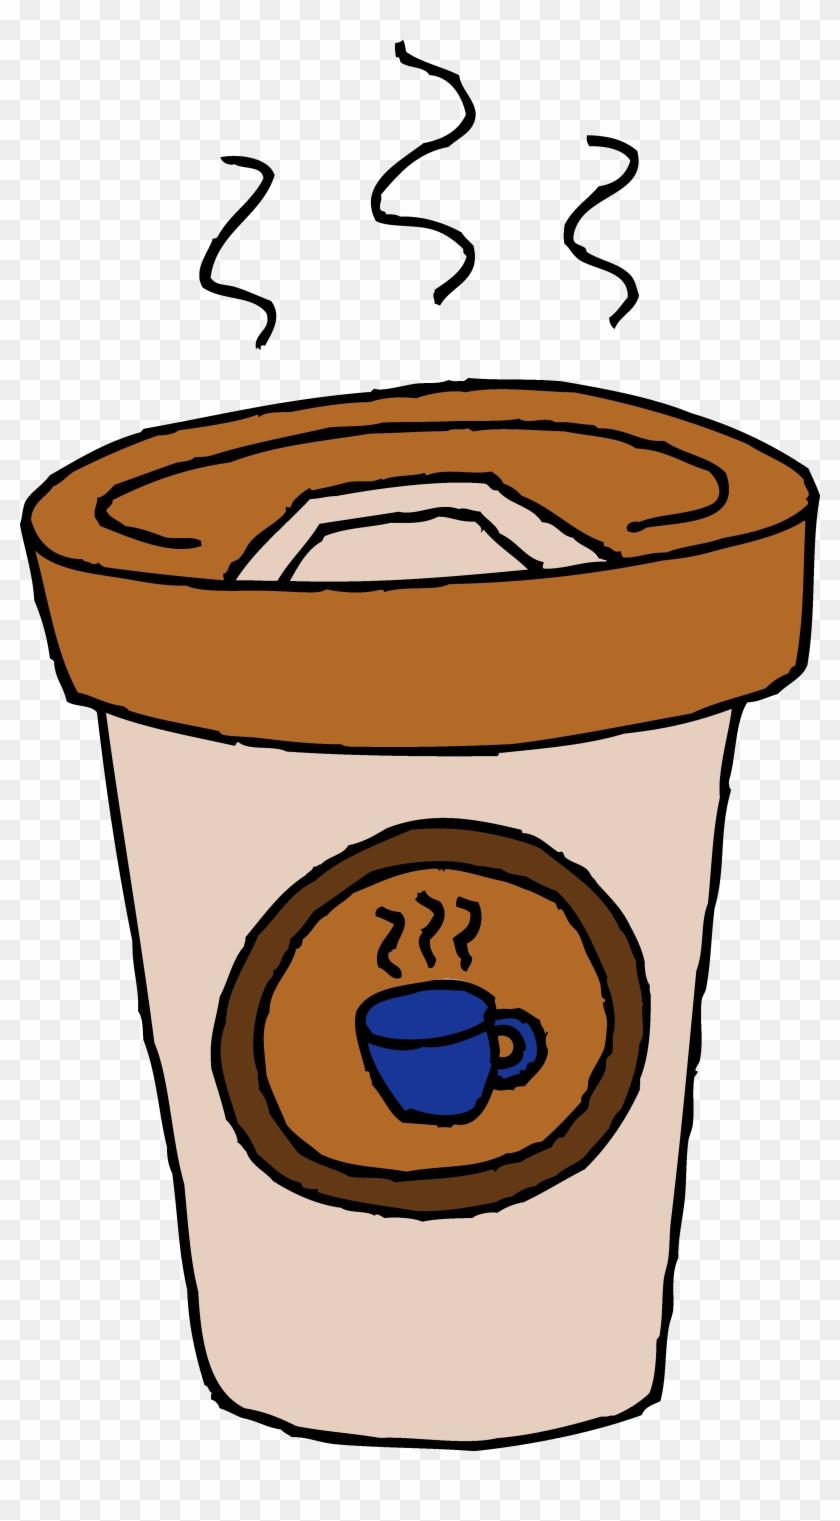 Clip Art Coffee - Paper Coffee Cups Clip Art #11972